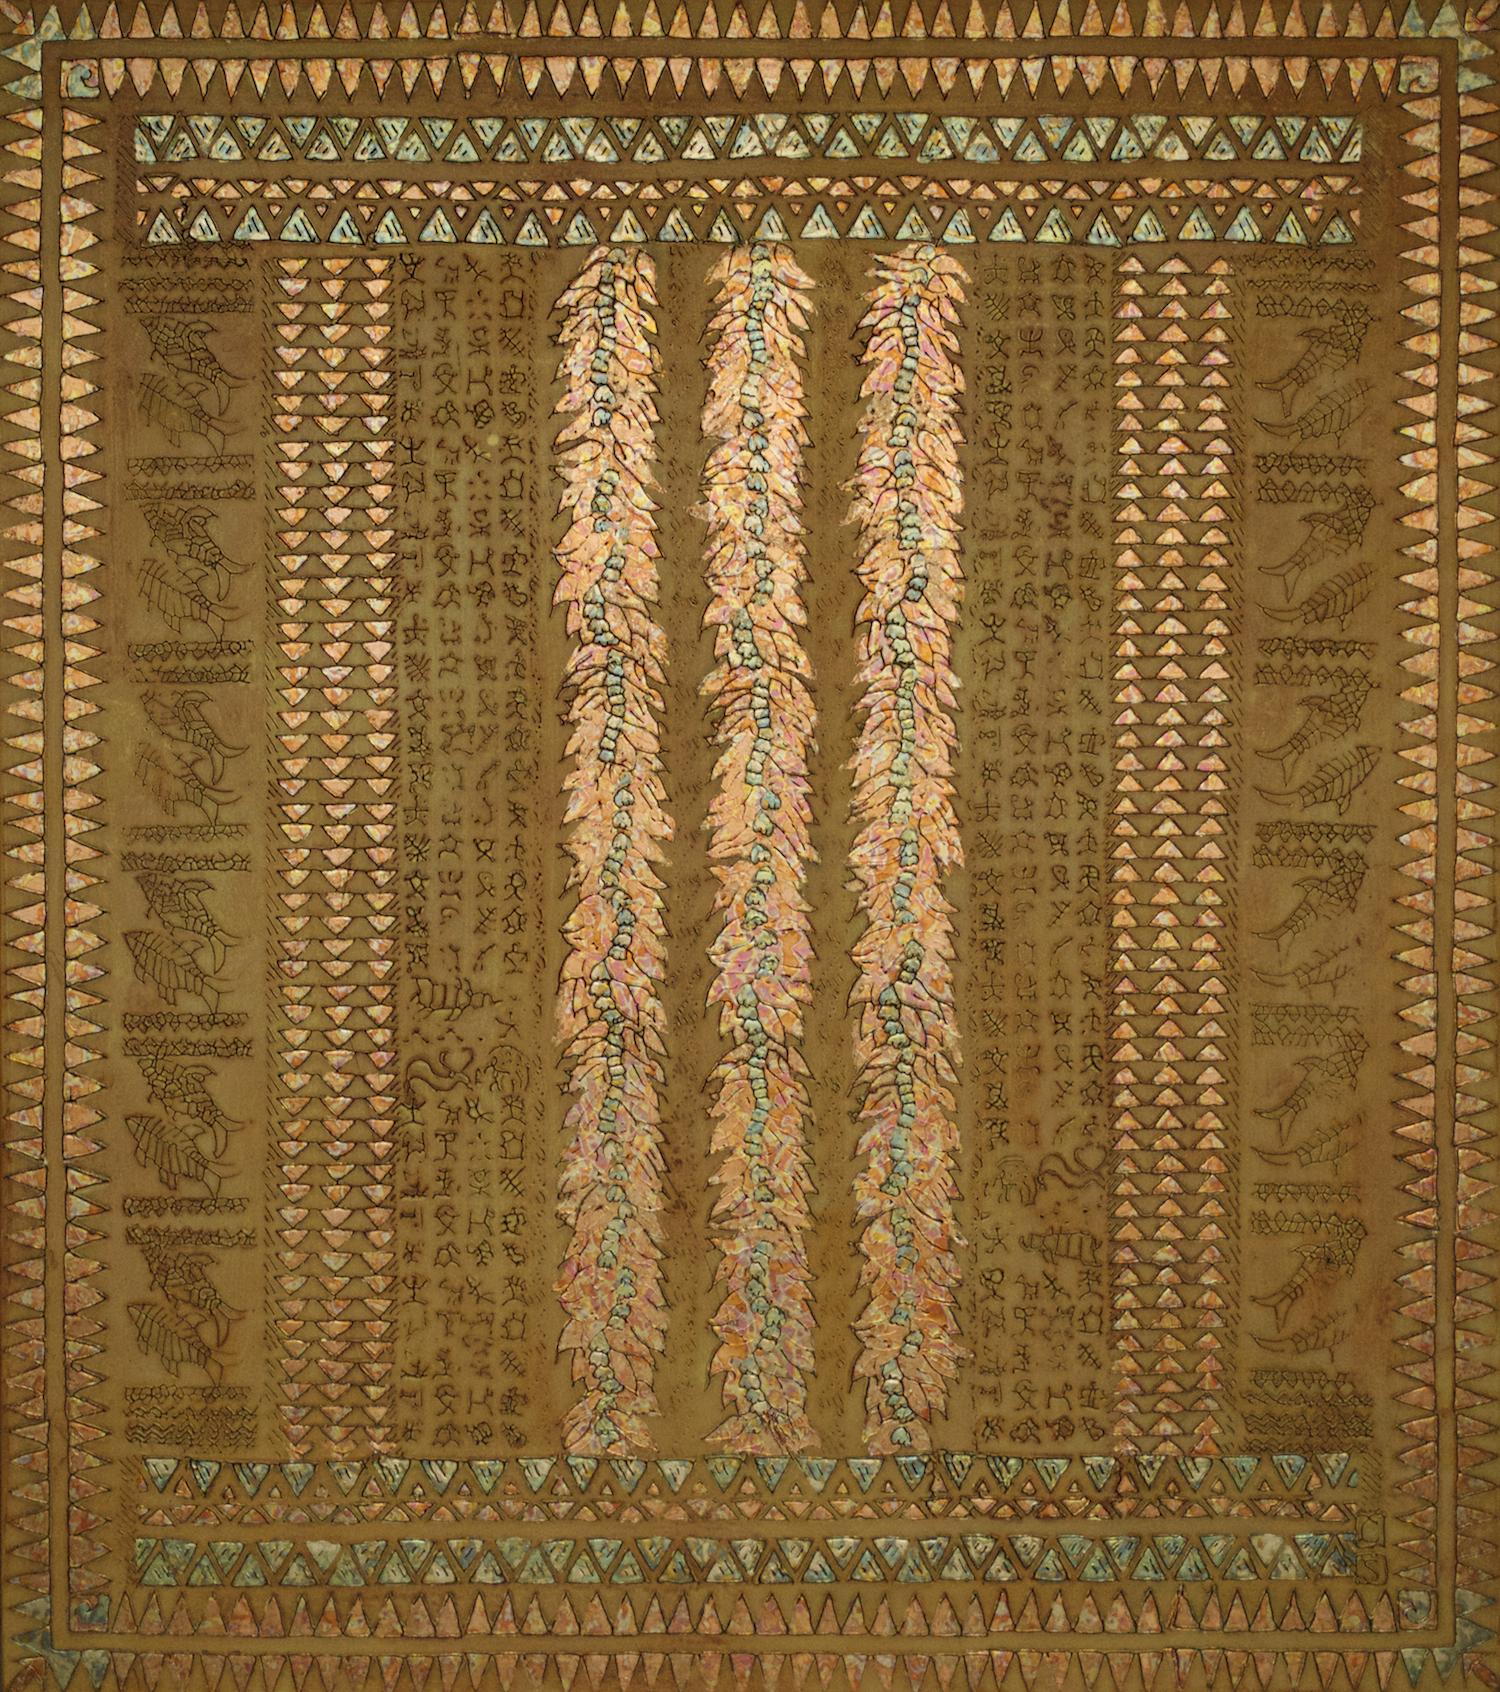 "Pua Pule (Hawaiian - FlowerPrayer) 47"" W x 53"" H x 2"" D Acrylic, oil & gold leaf on archival board"